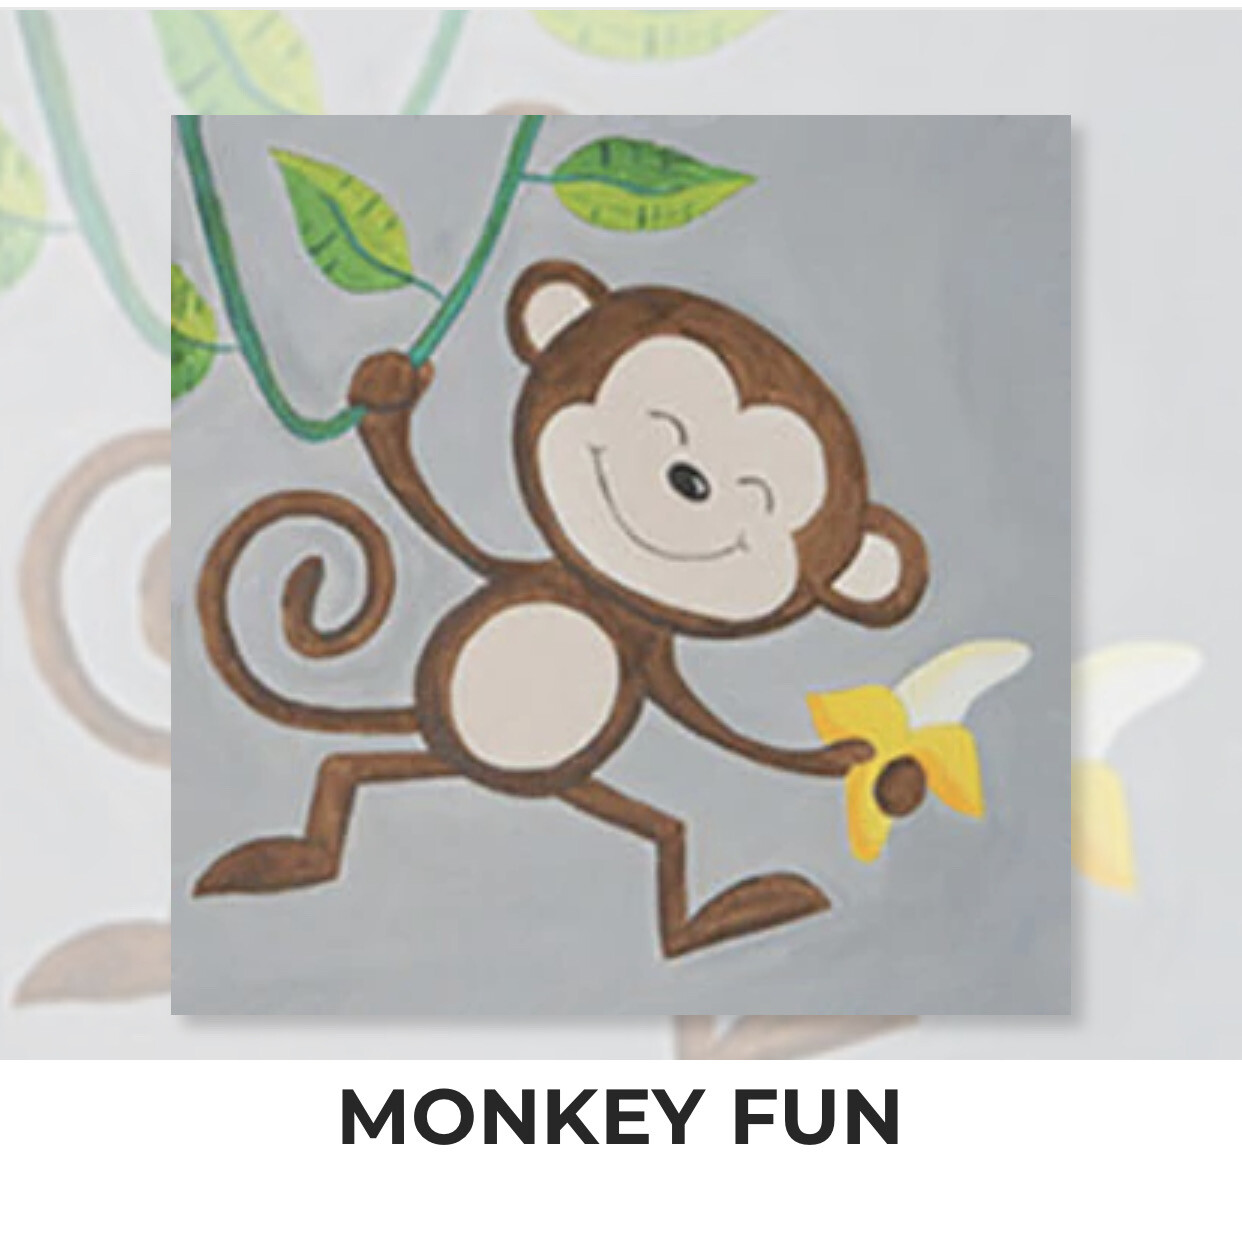 Monkey Fun KIDS Acrylic Paint On Canvas DIY Art Kit